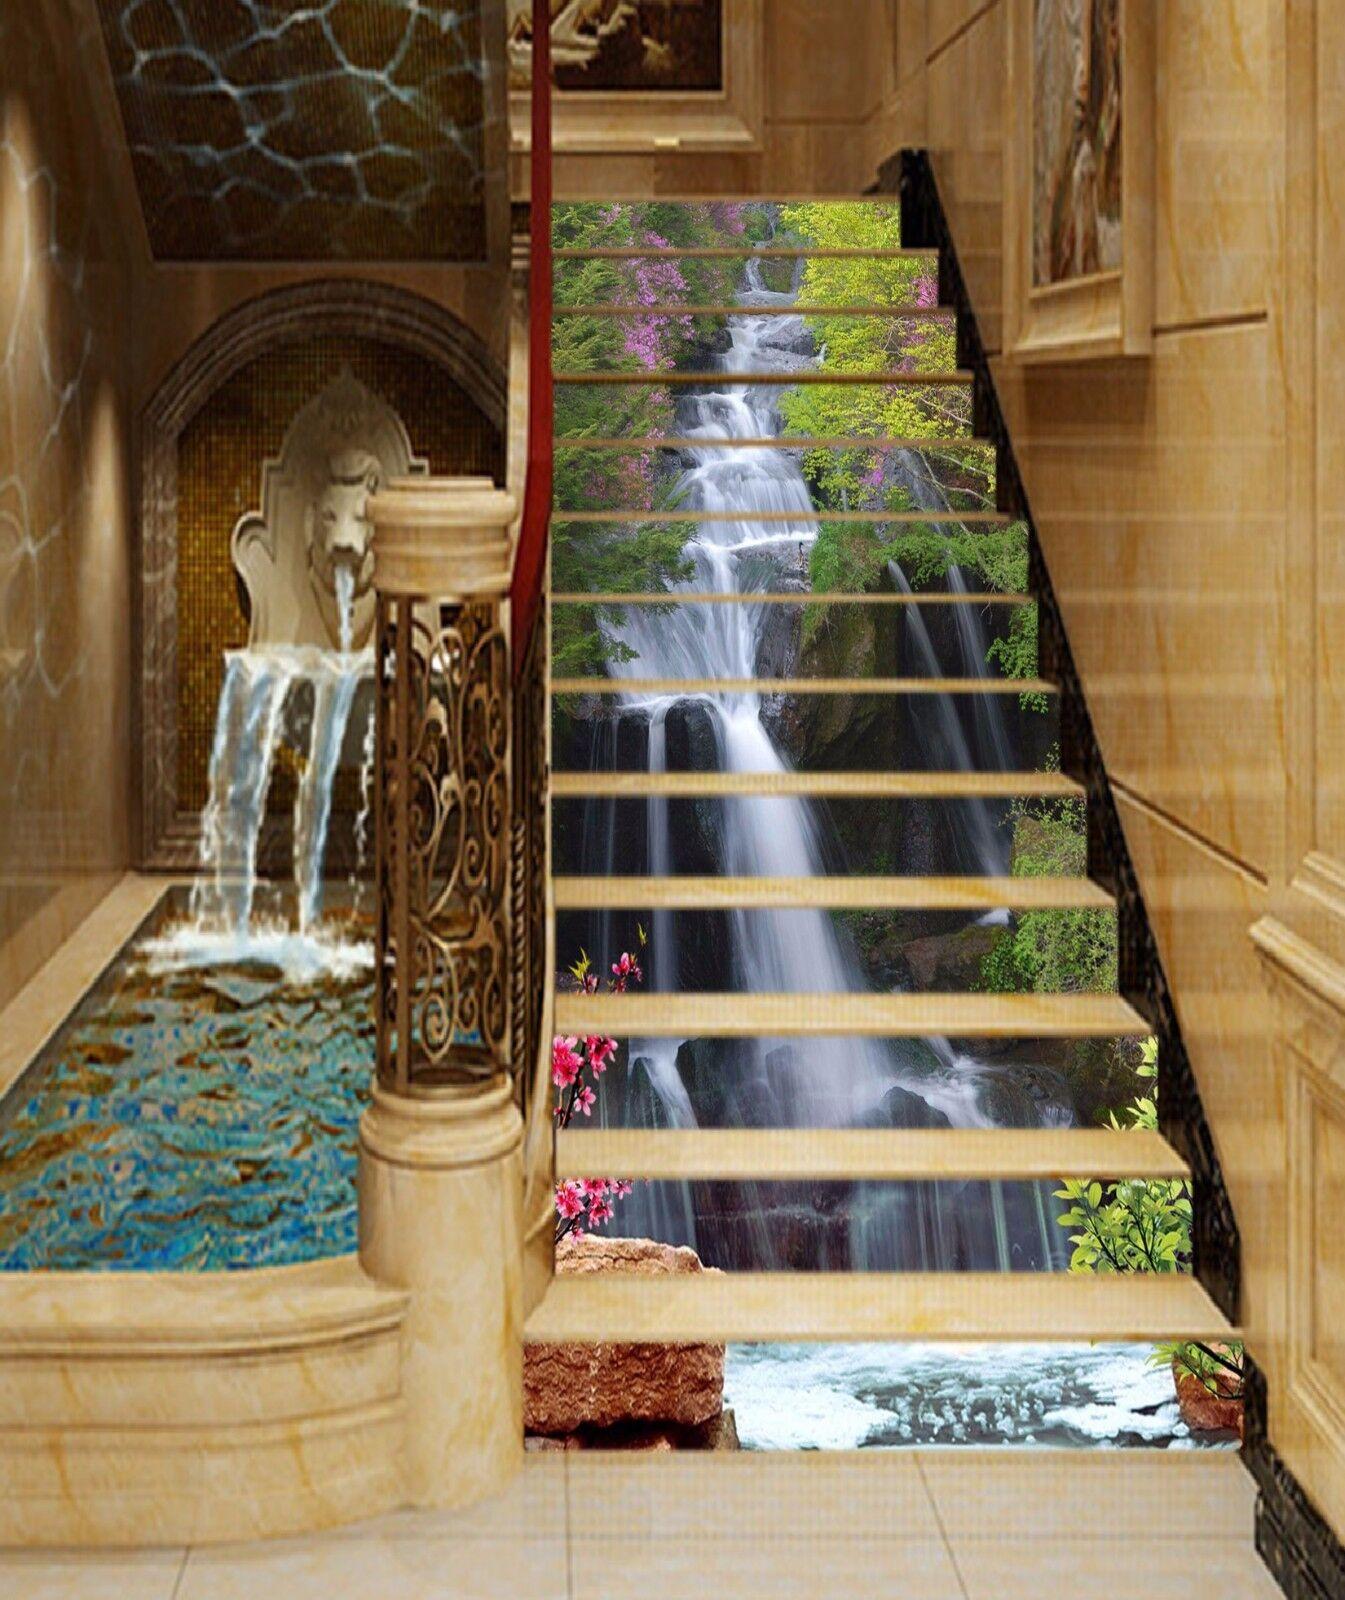 3D Waterfall leaves Stair Risers Decoration Photo Mural Vinyl Decal Wallpaper AU